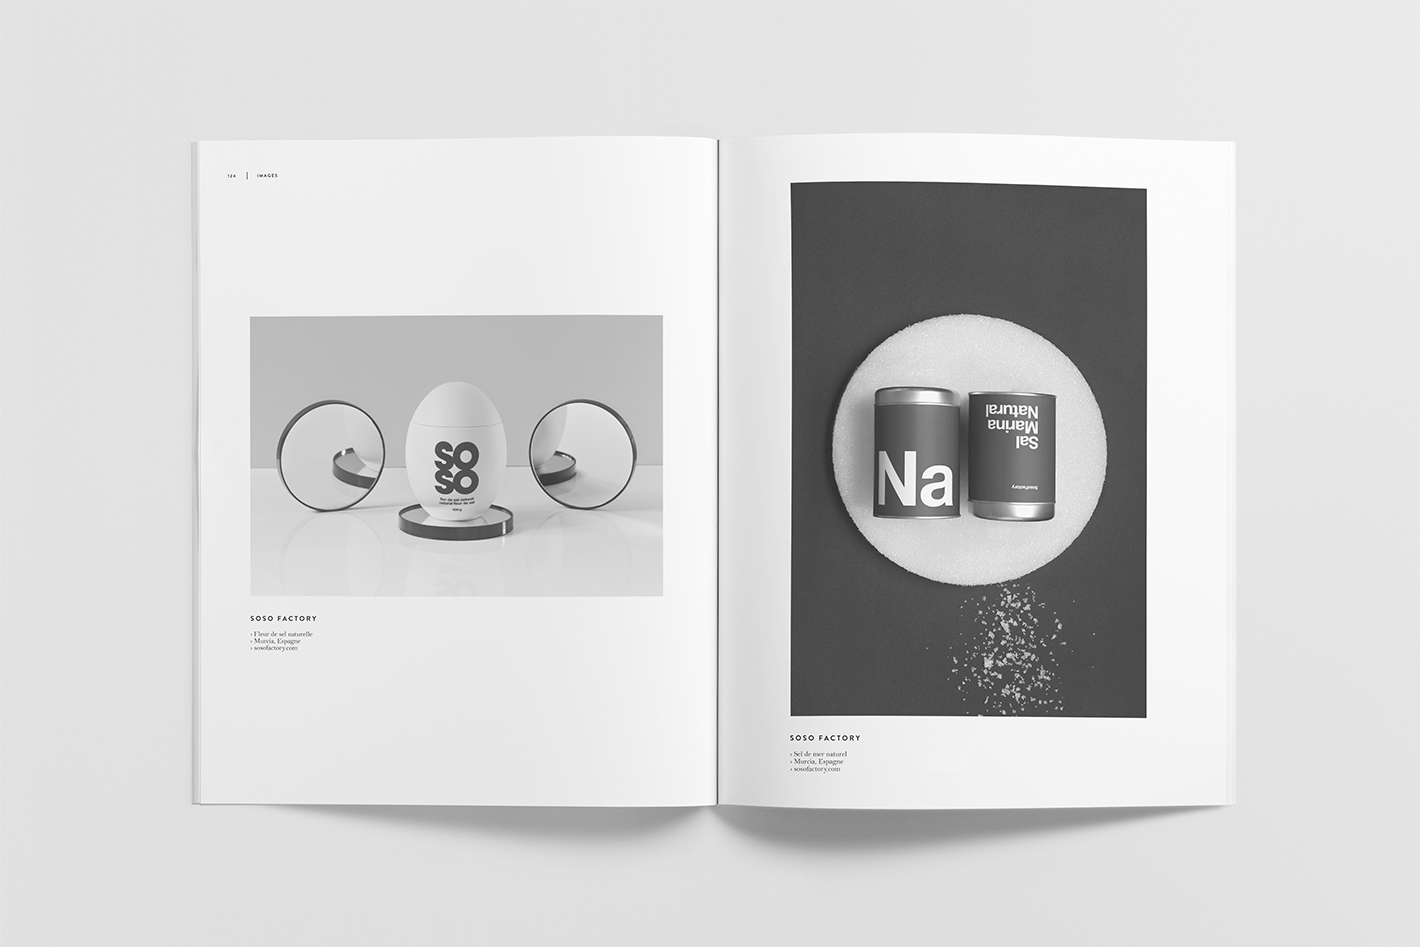 Figure-Dinette-Magazine-Branding-Couverture-Livre-Restaurant-Jeremy-Hall-Photographie-Quebec-7.jpg